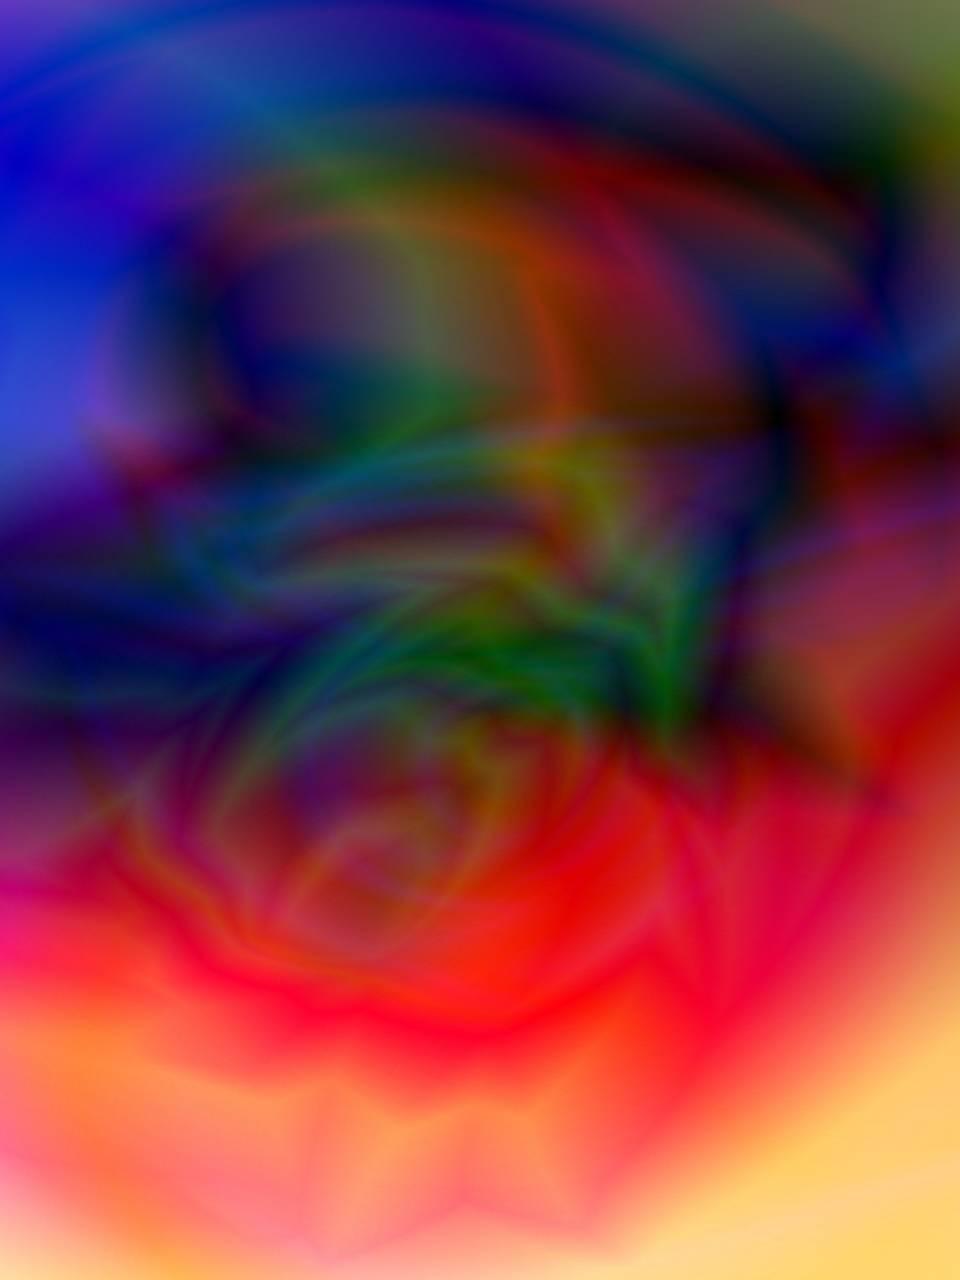 Nokia Colorful HD